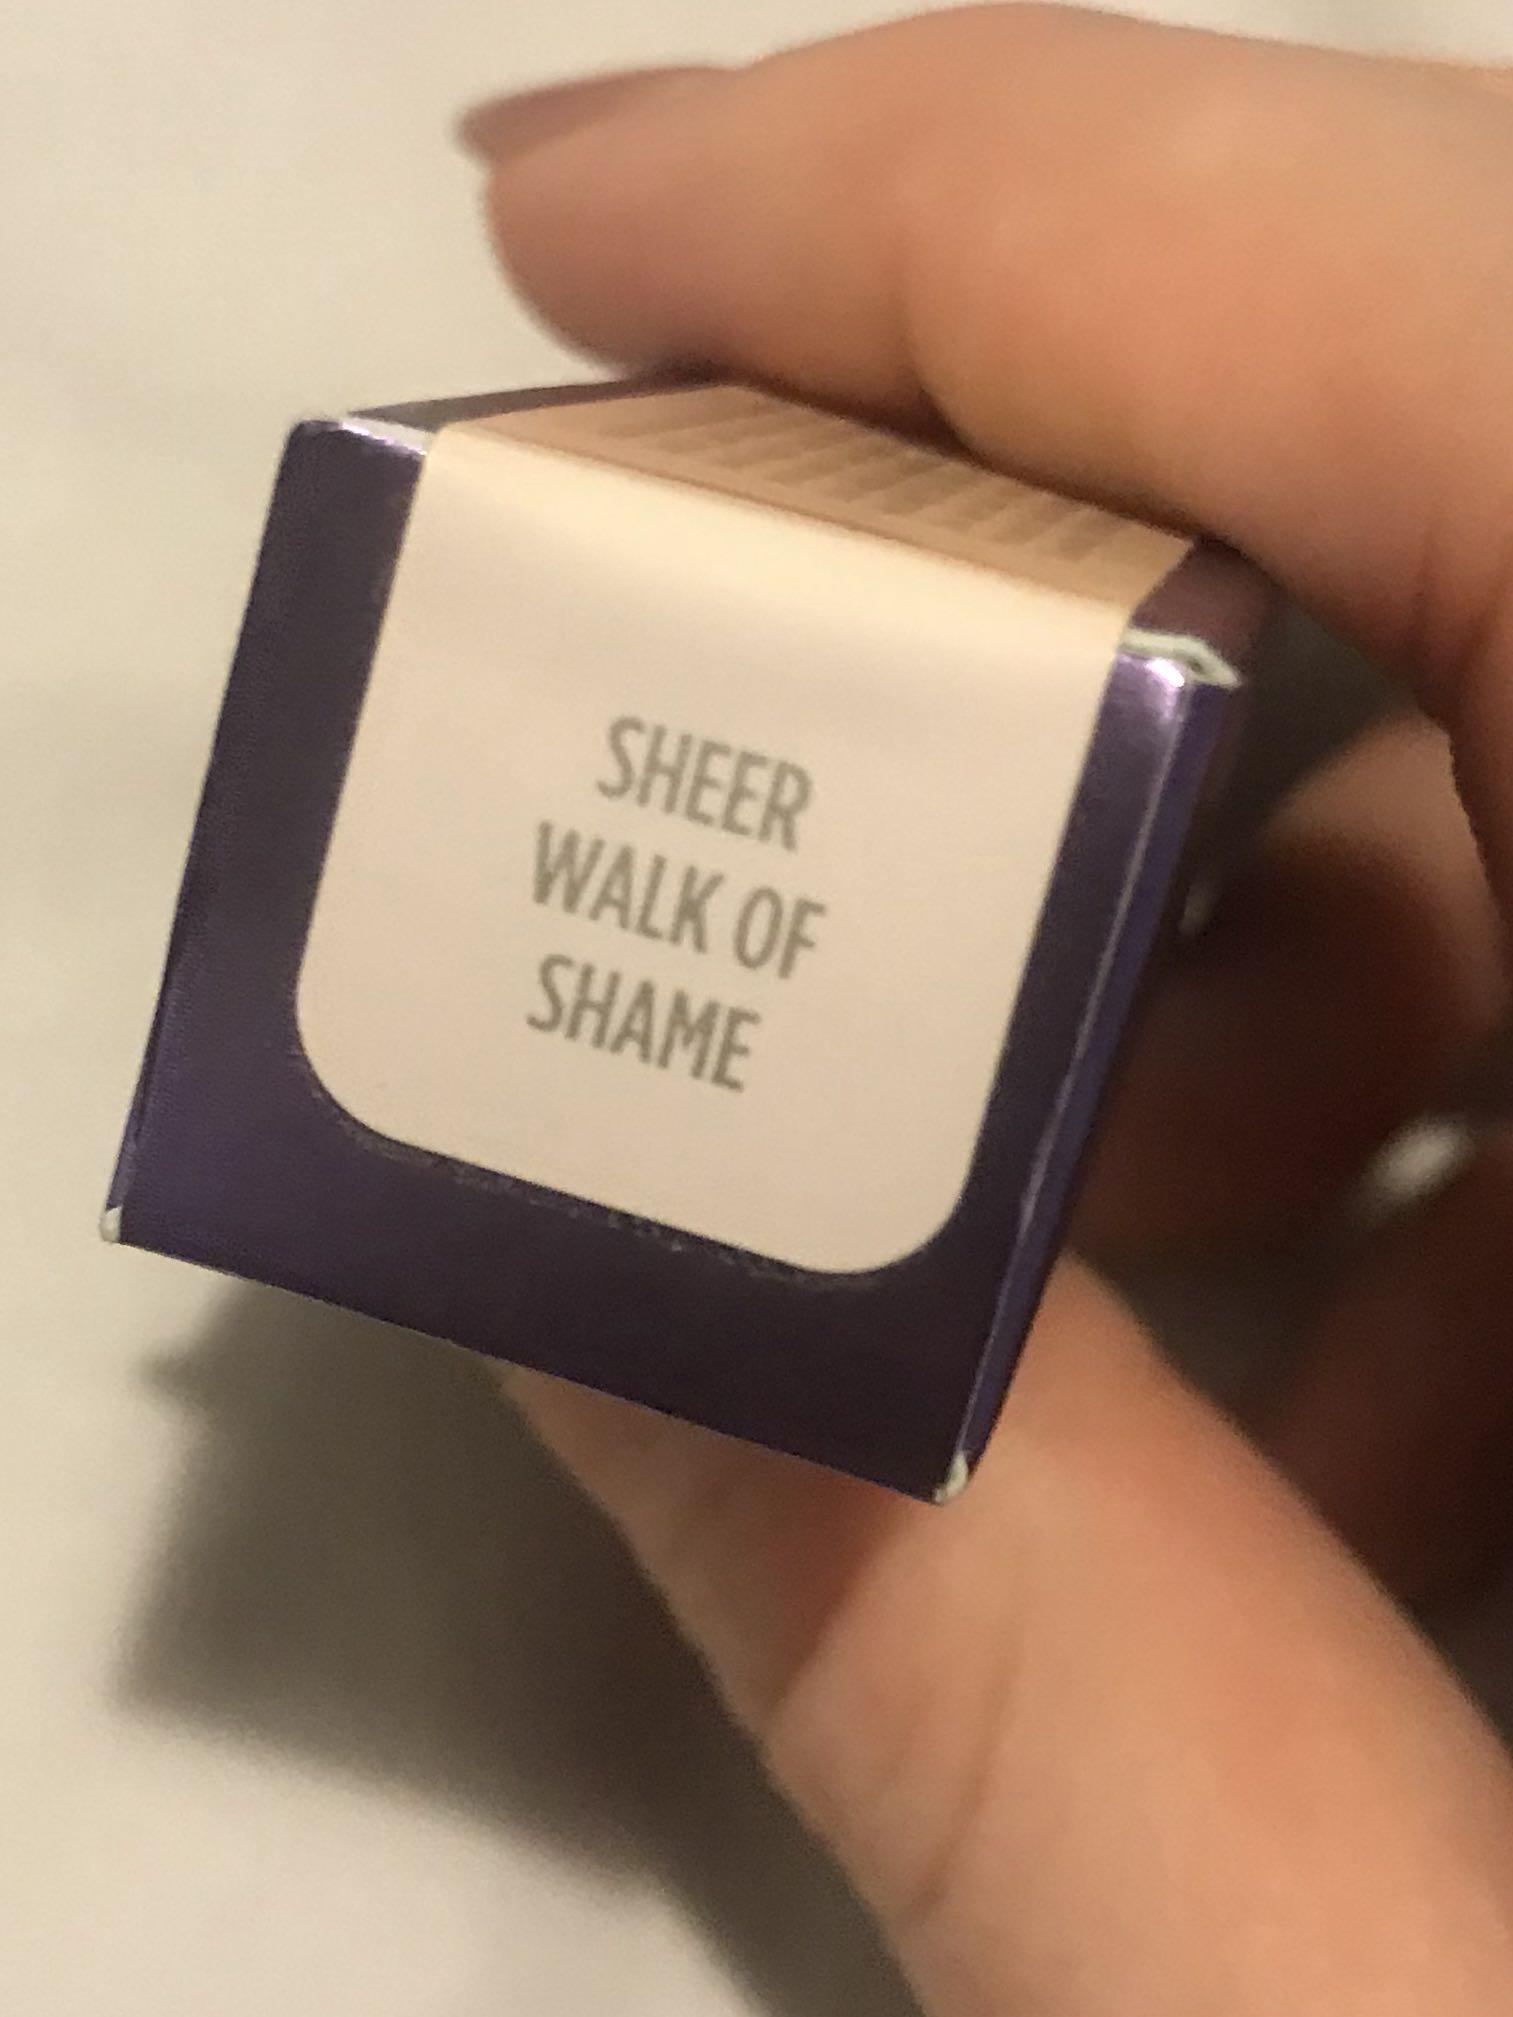 URBAN DECAY. Brand New. Sheer Revolution Lipstick. Sheer walk of shame